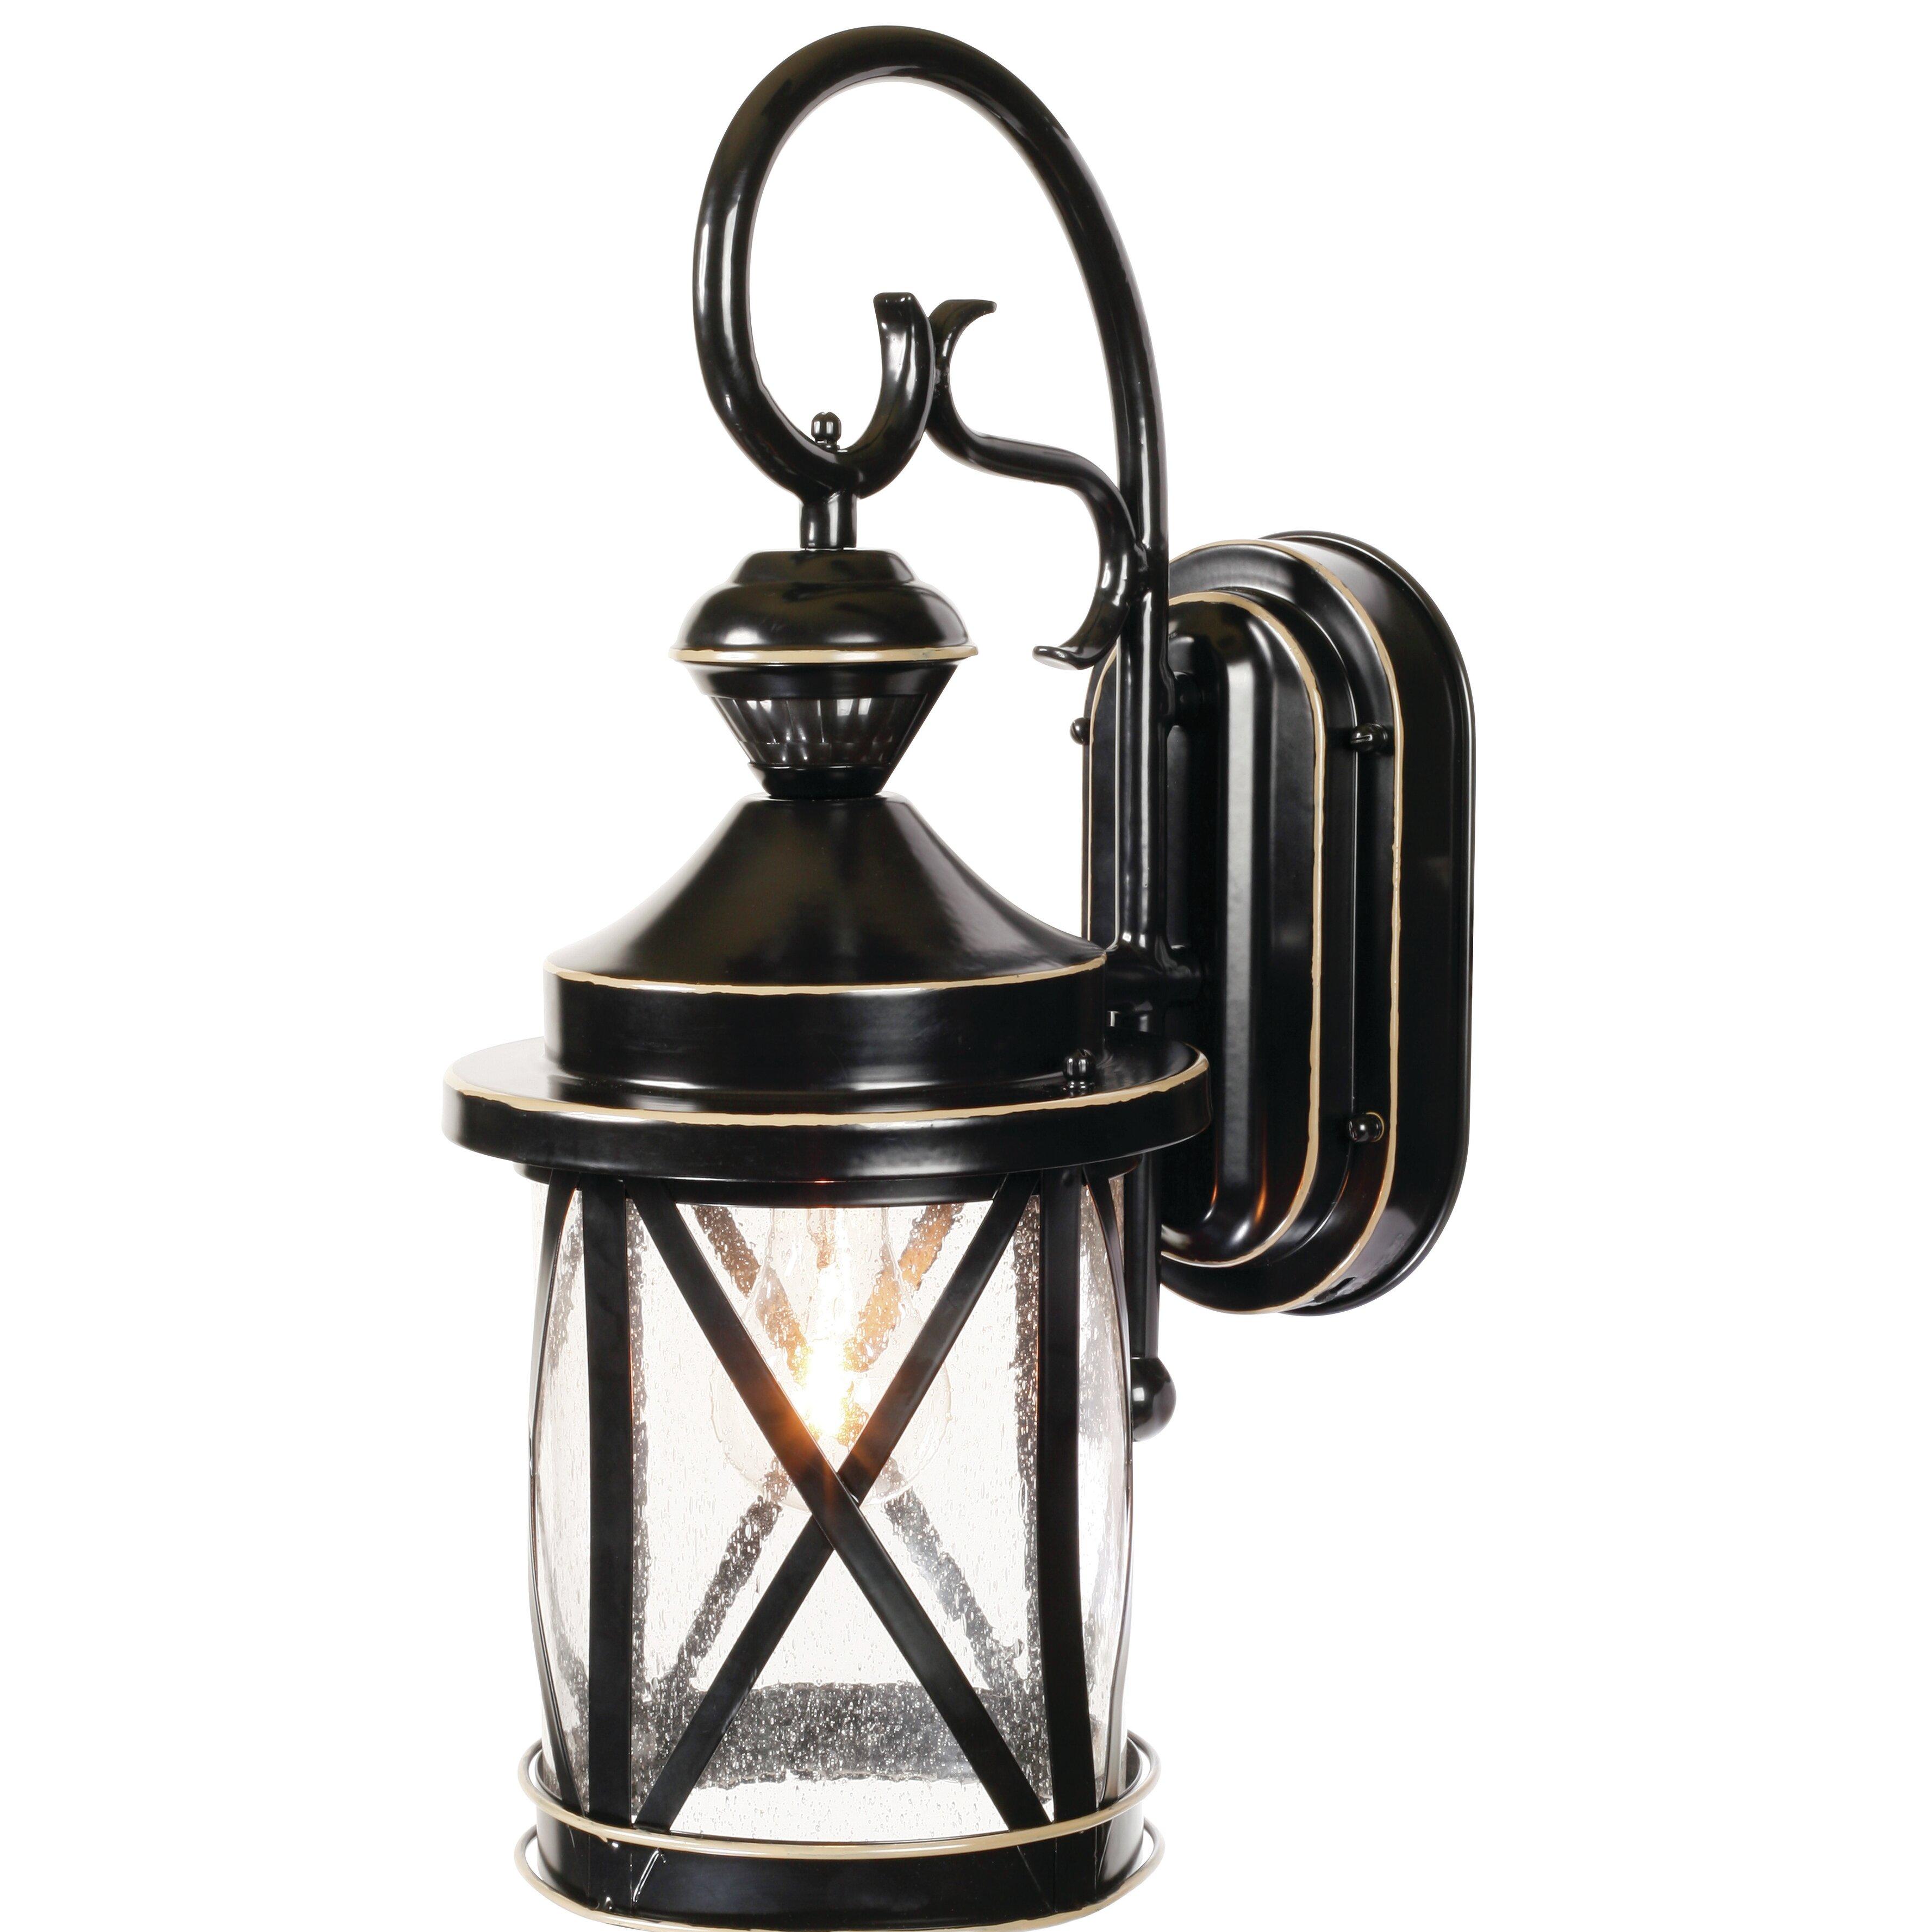 Outside Wall Lights Lantern : Heath-Zenith 1 Light Outdoor Wall Lantern & Reviews Wayfair